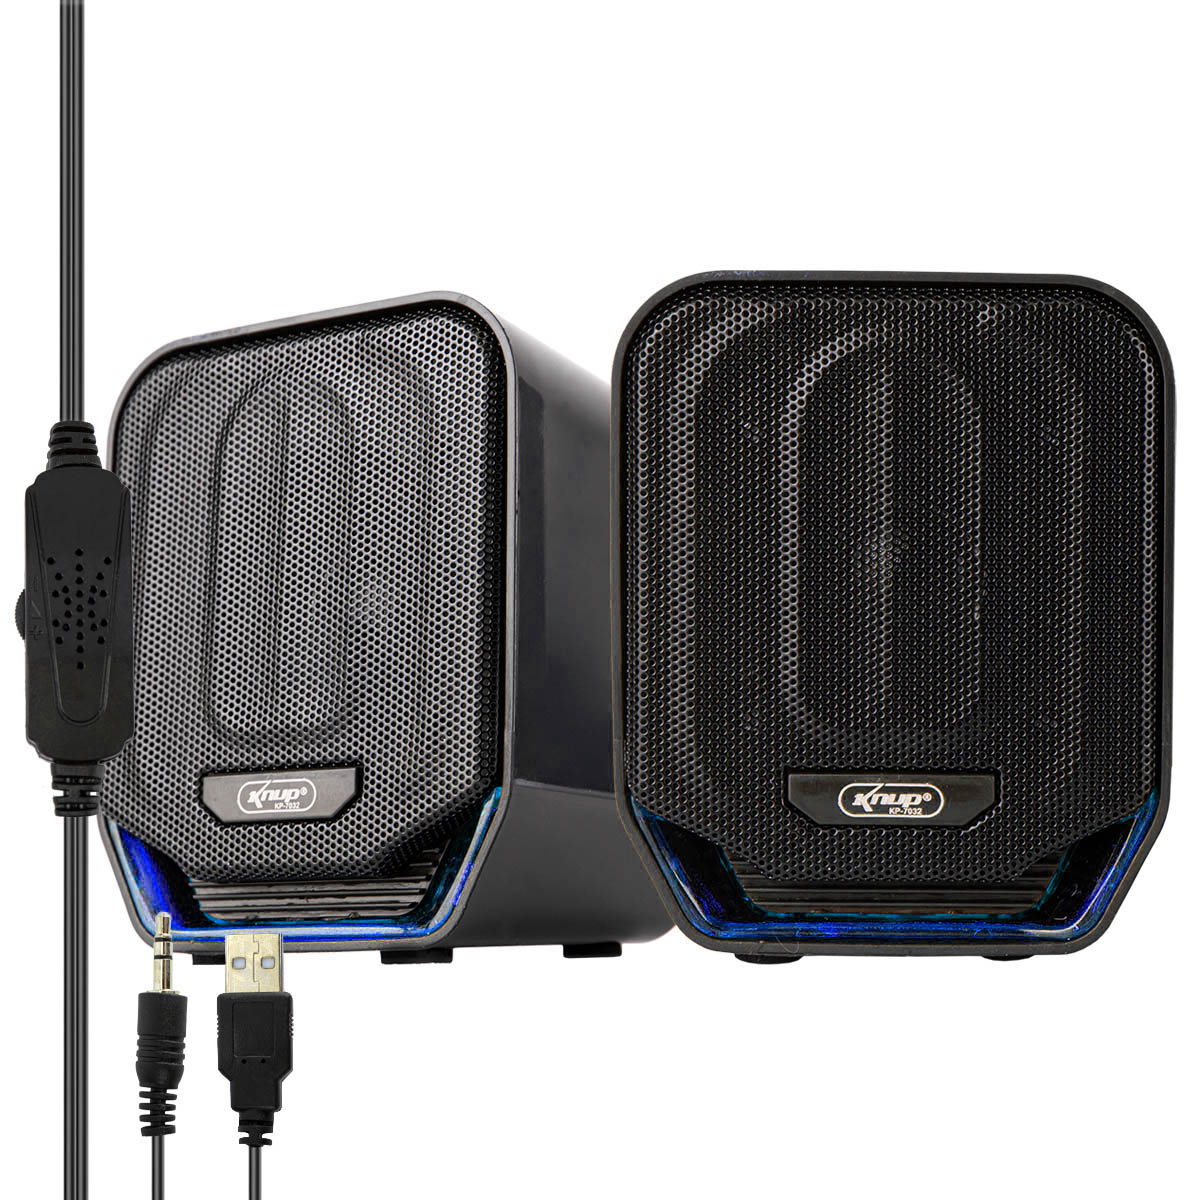 Caixa de Som para PC e Celular 12 Watts RMS 2.0 Auxiliar P2 Knup KP-7032